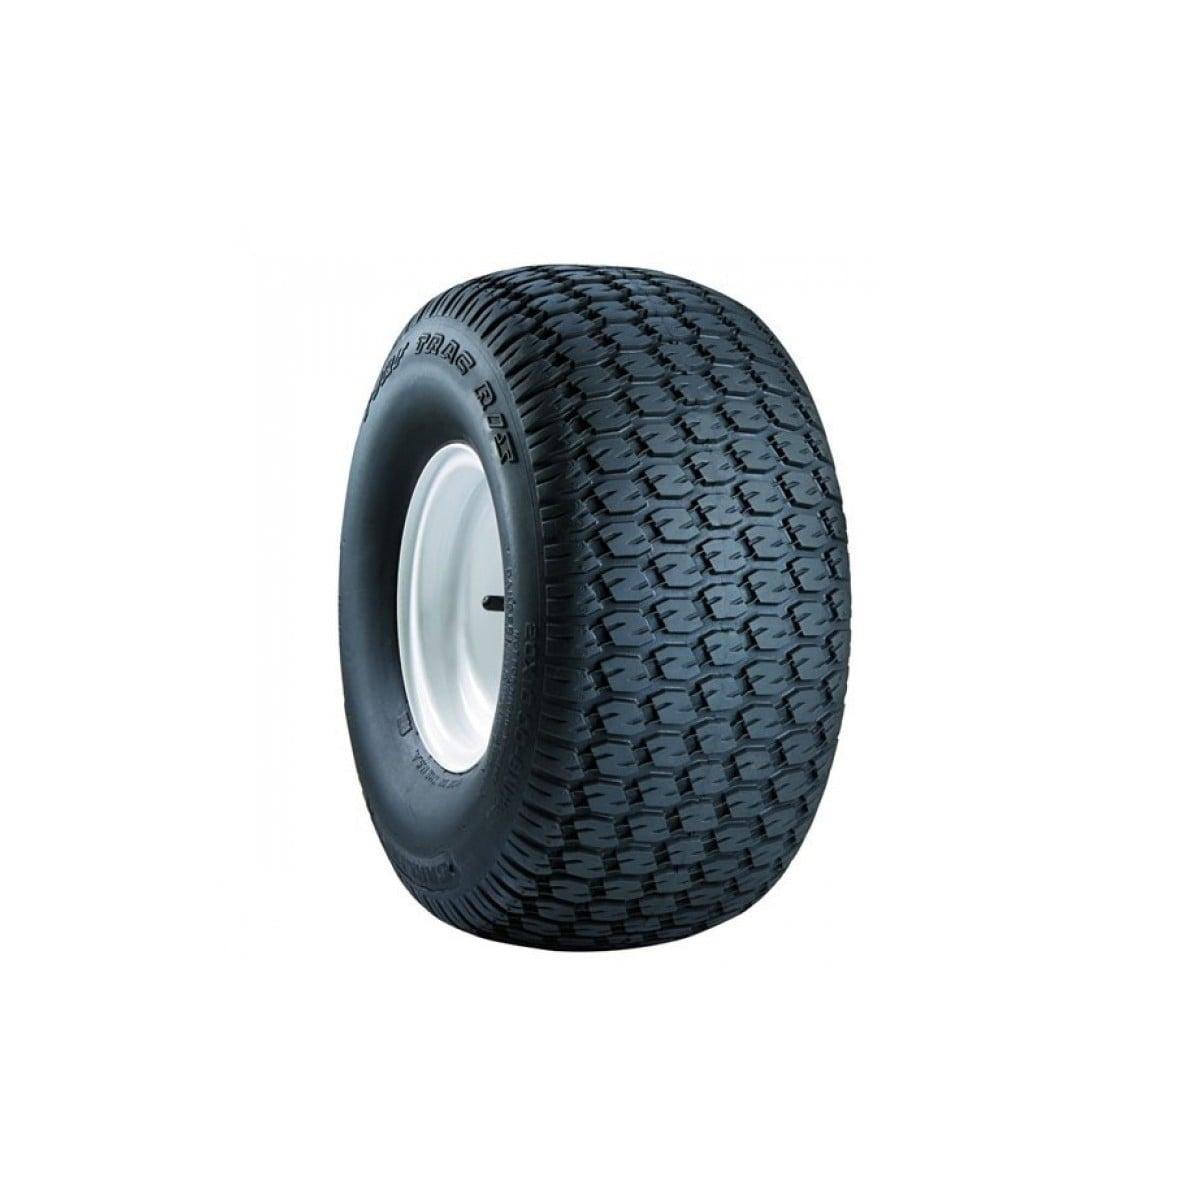 Carlisle Turf Trac RS Lawn & Garden Tire - 18X850-8 LRB/4...